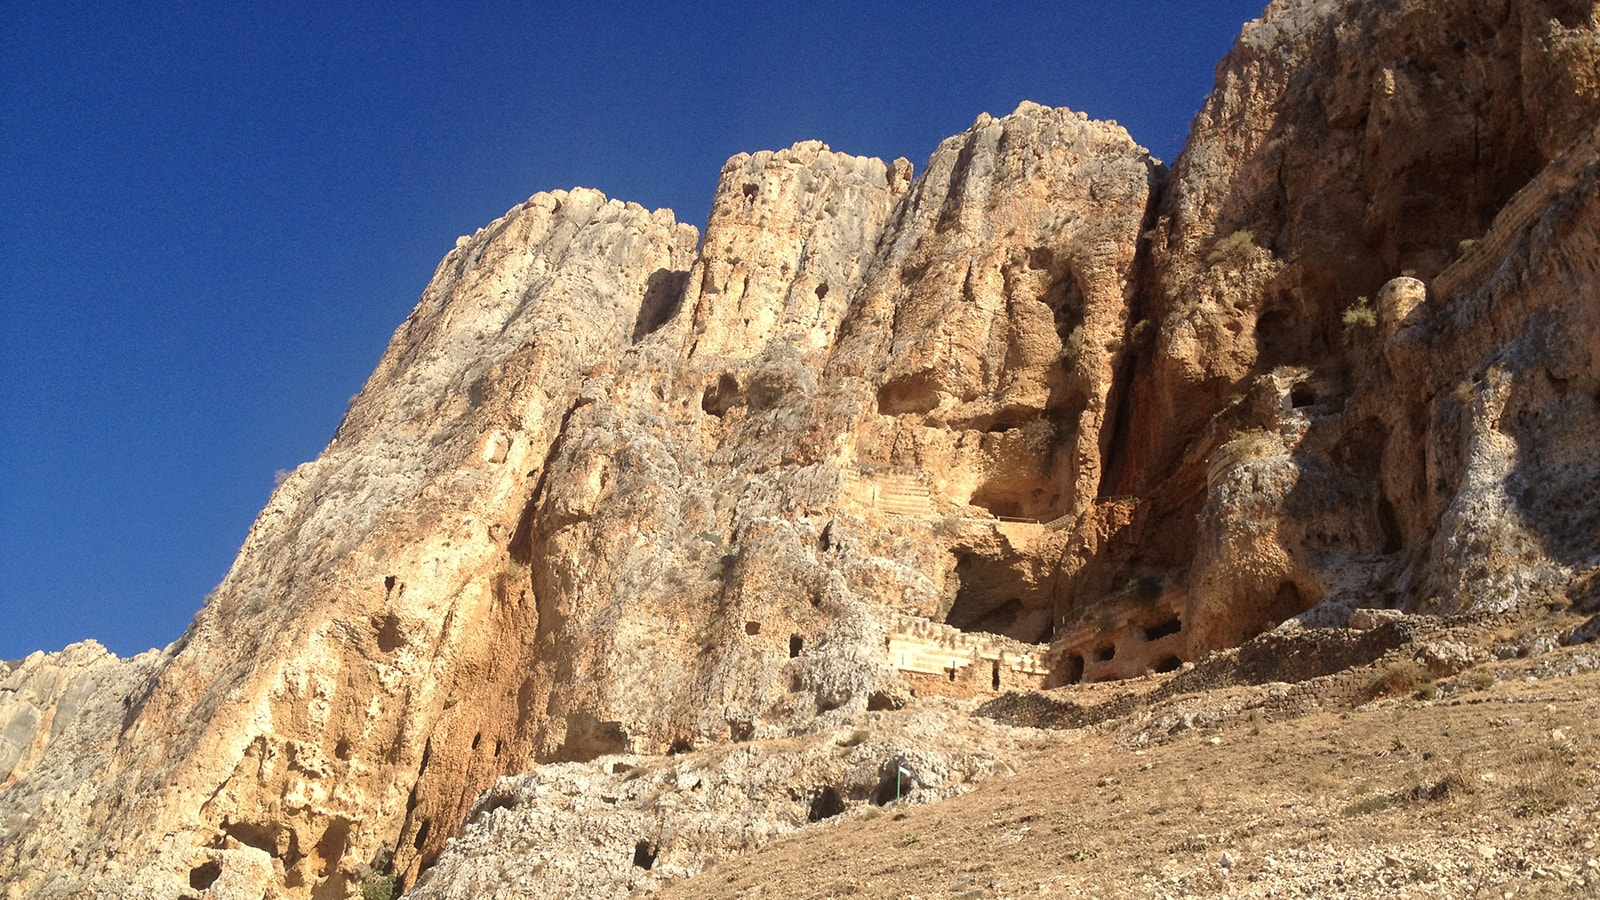 Guy-Stagg-The-Crossway-caves-Upper-Jordan